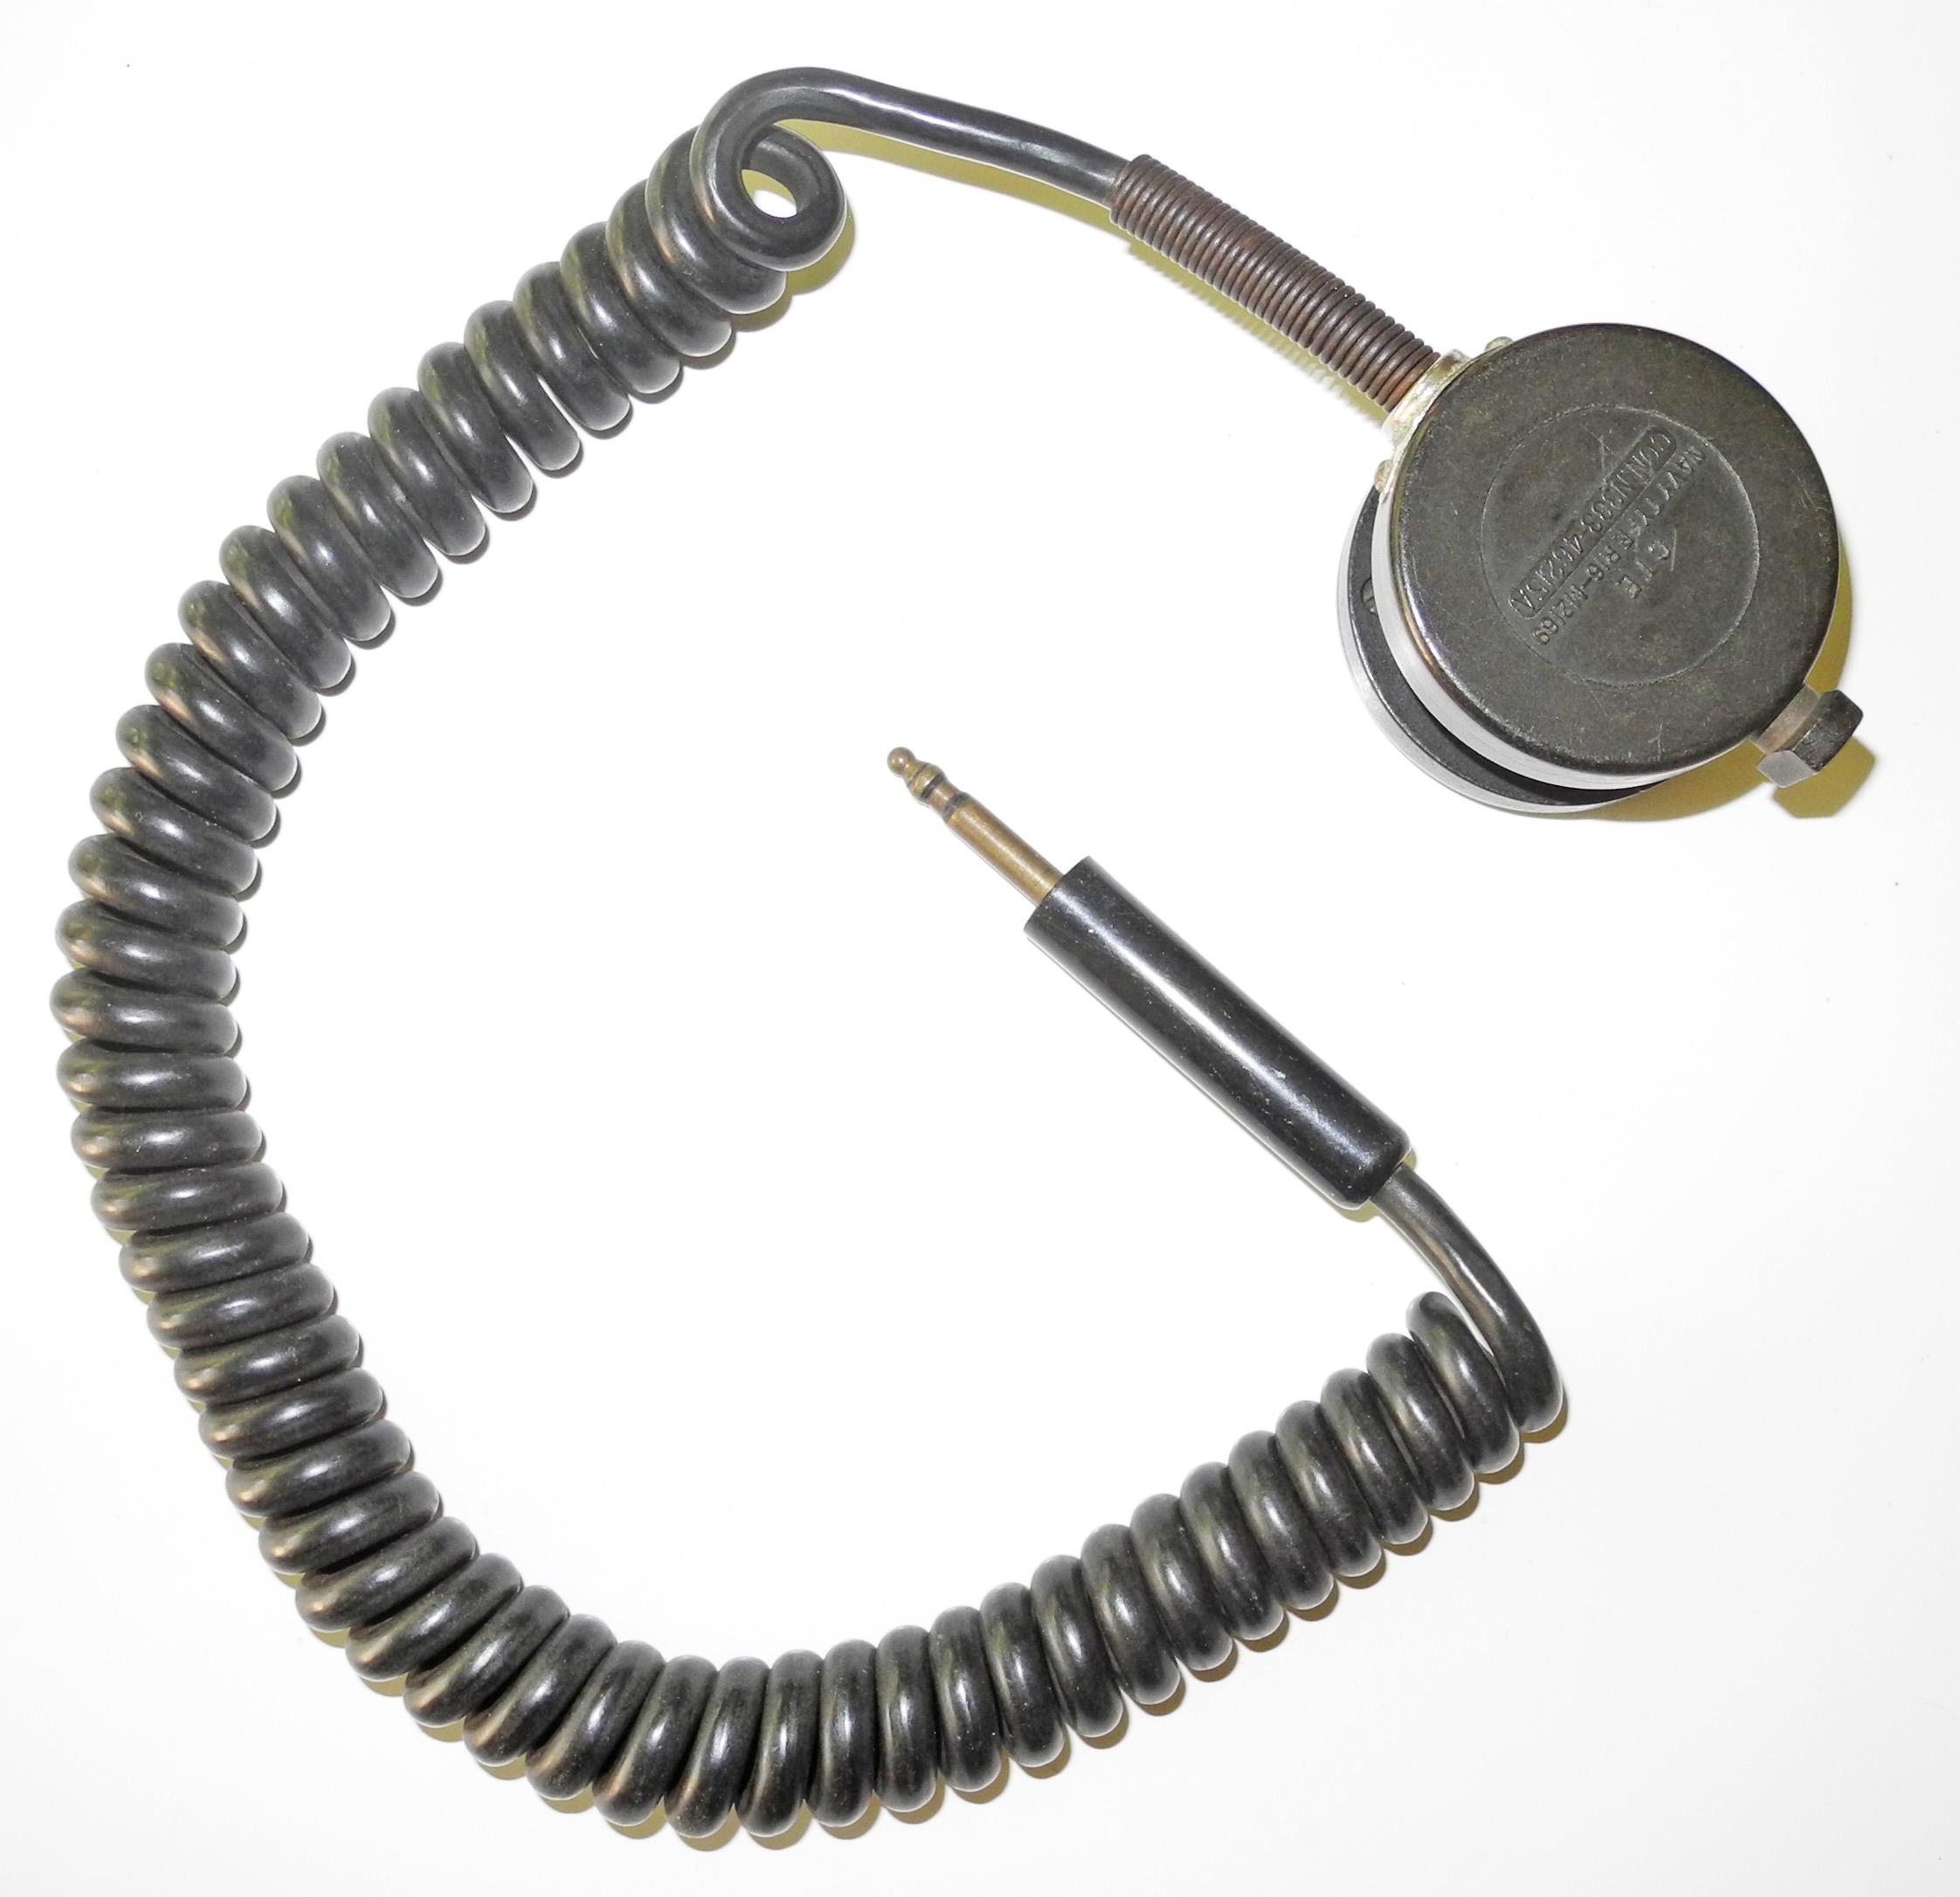 USN R16 hand-held microphone